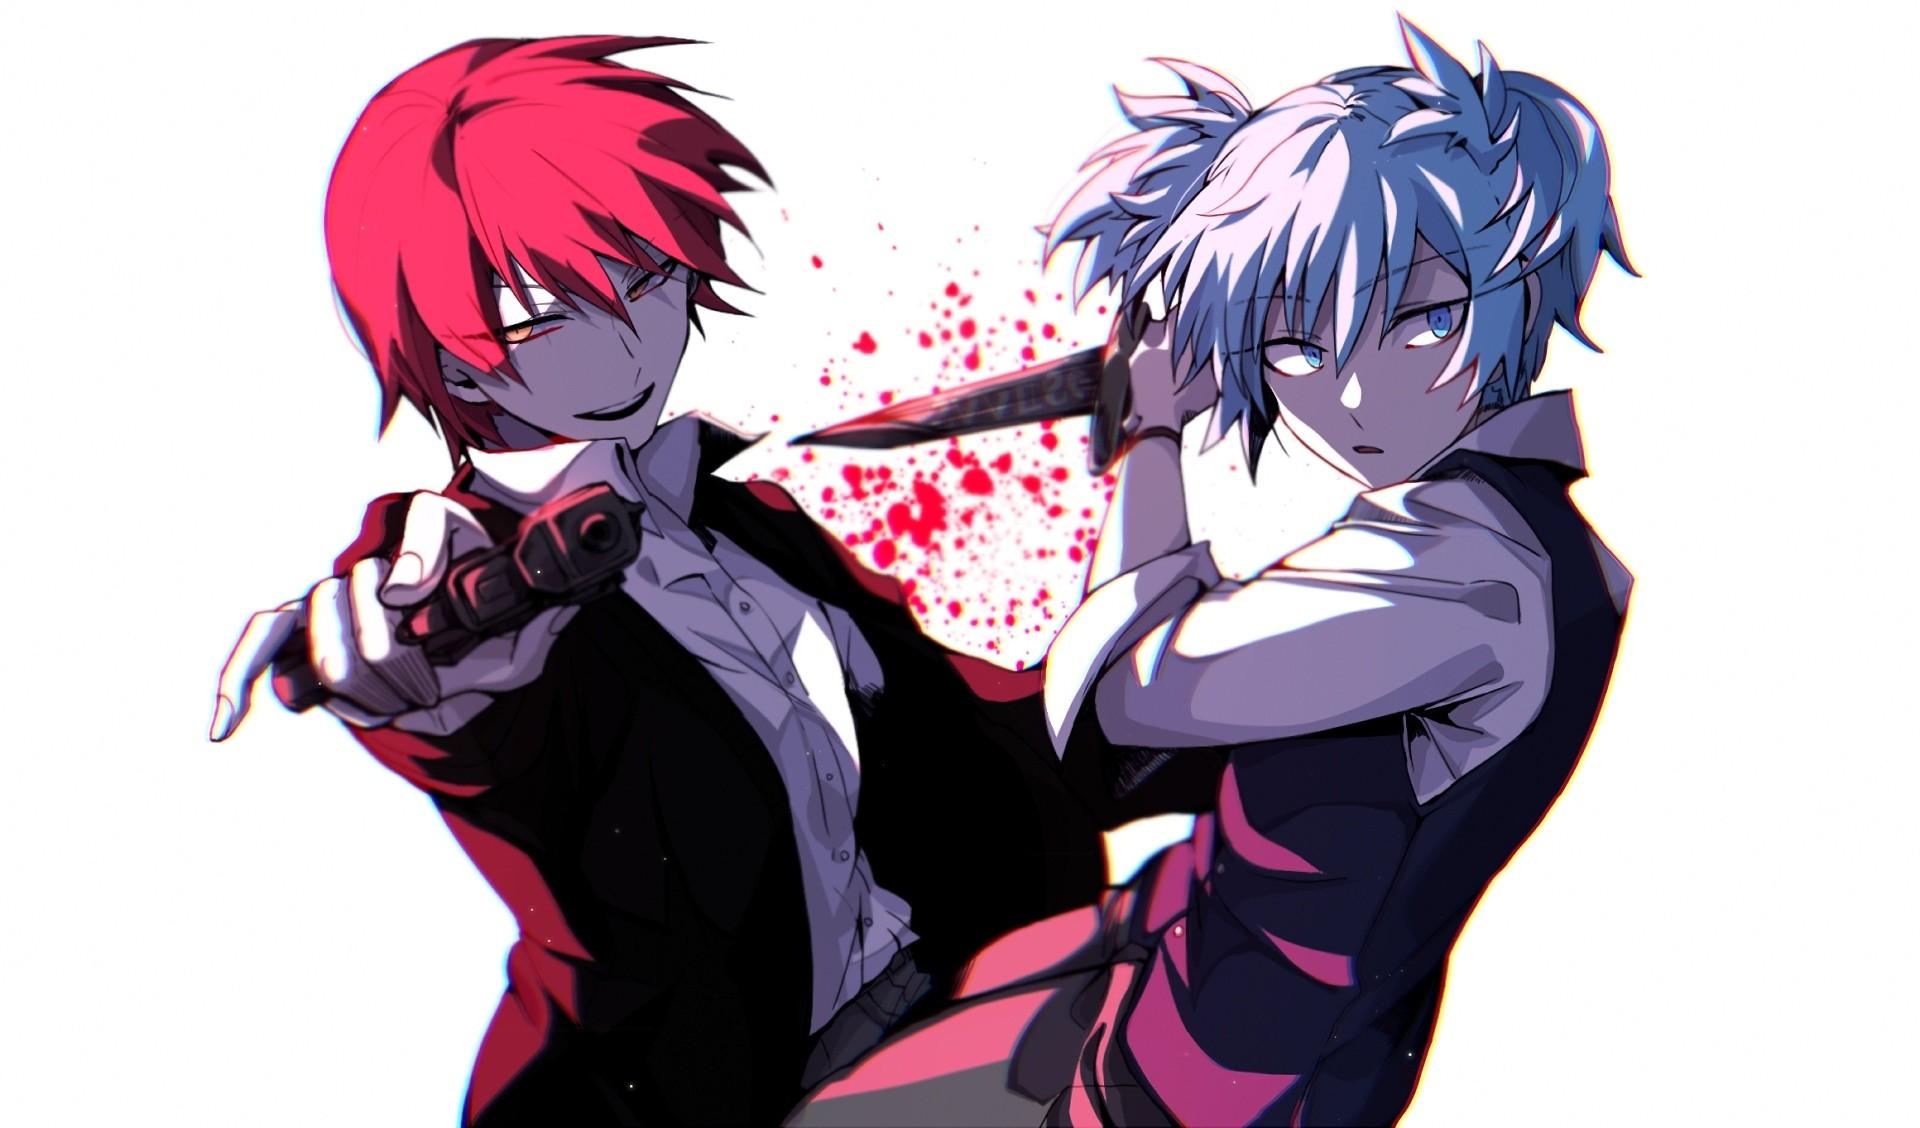 Theme Anime Anime Wallpaper Assassination Classroom